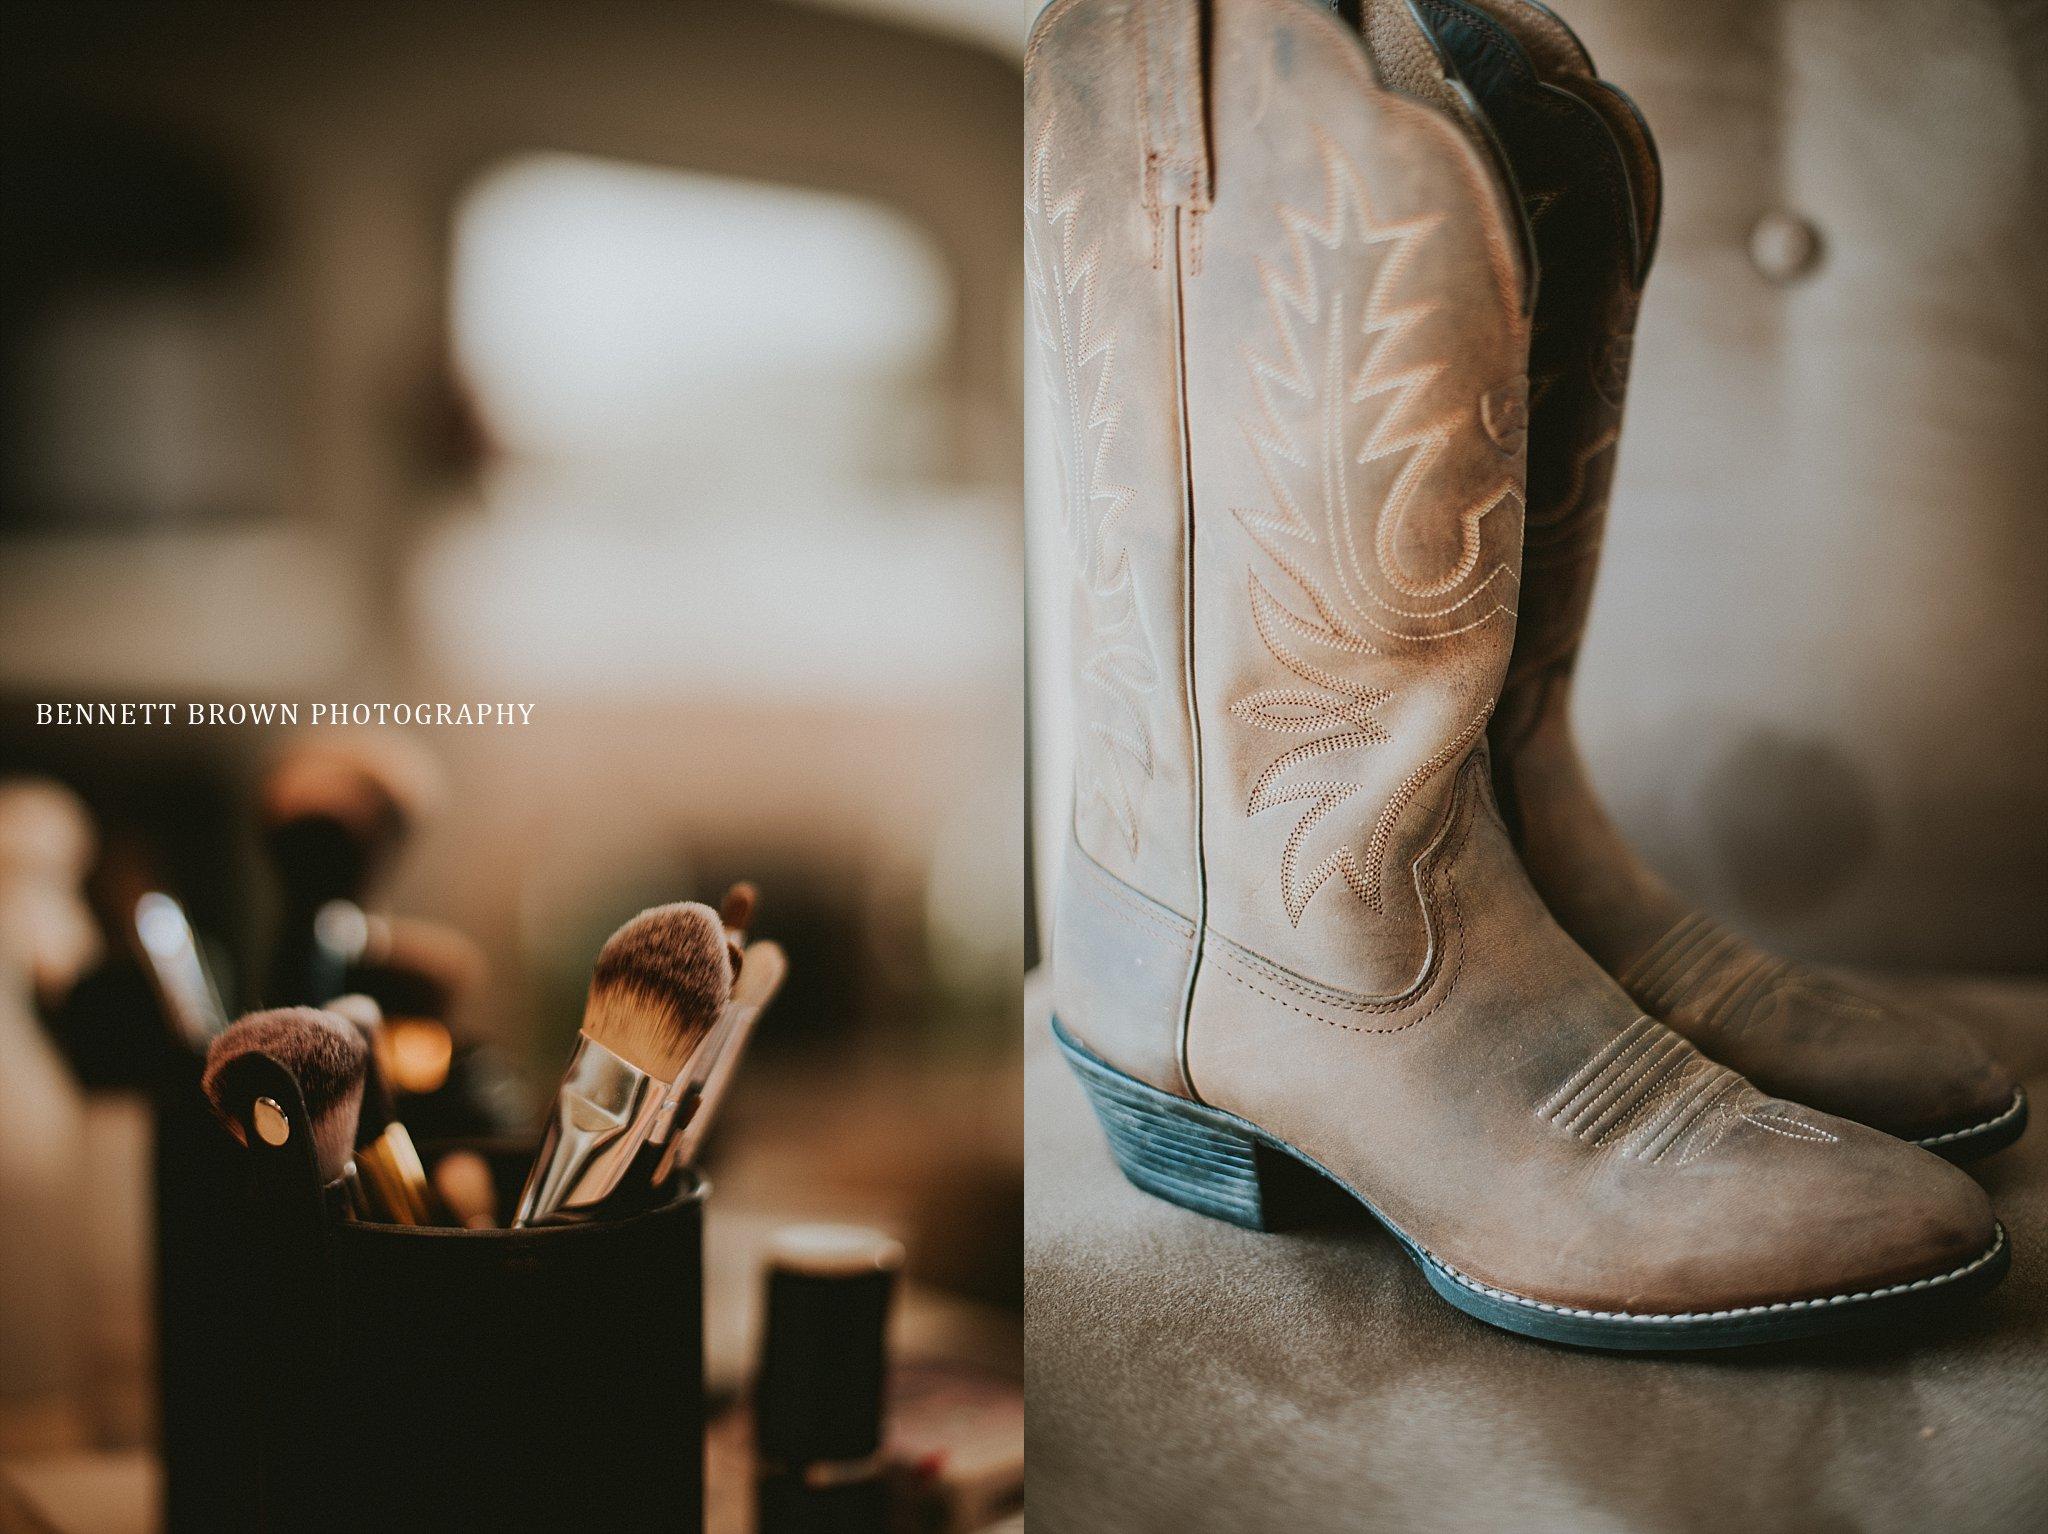 Bennett Brown Photography wedding details make up brush cowboy boot Frisco Texas